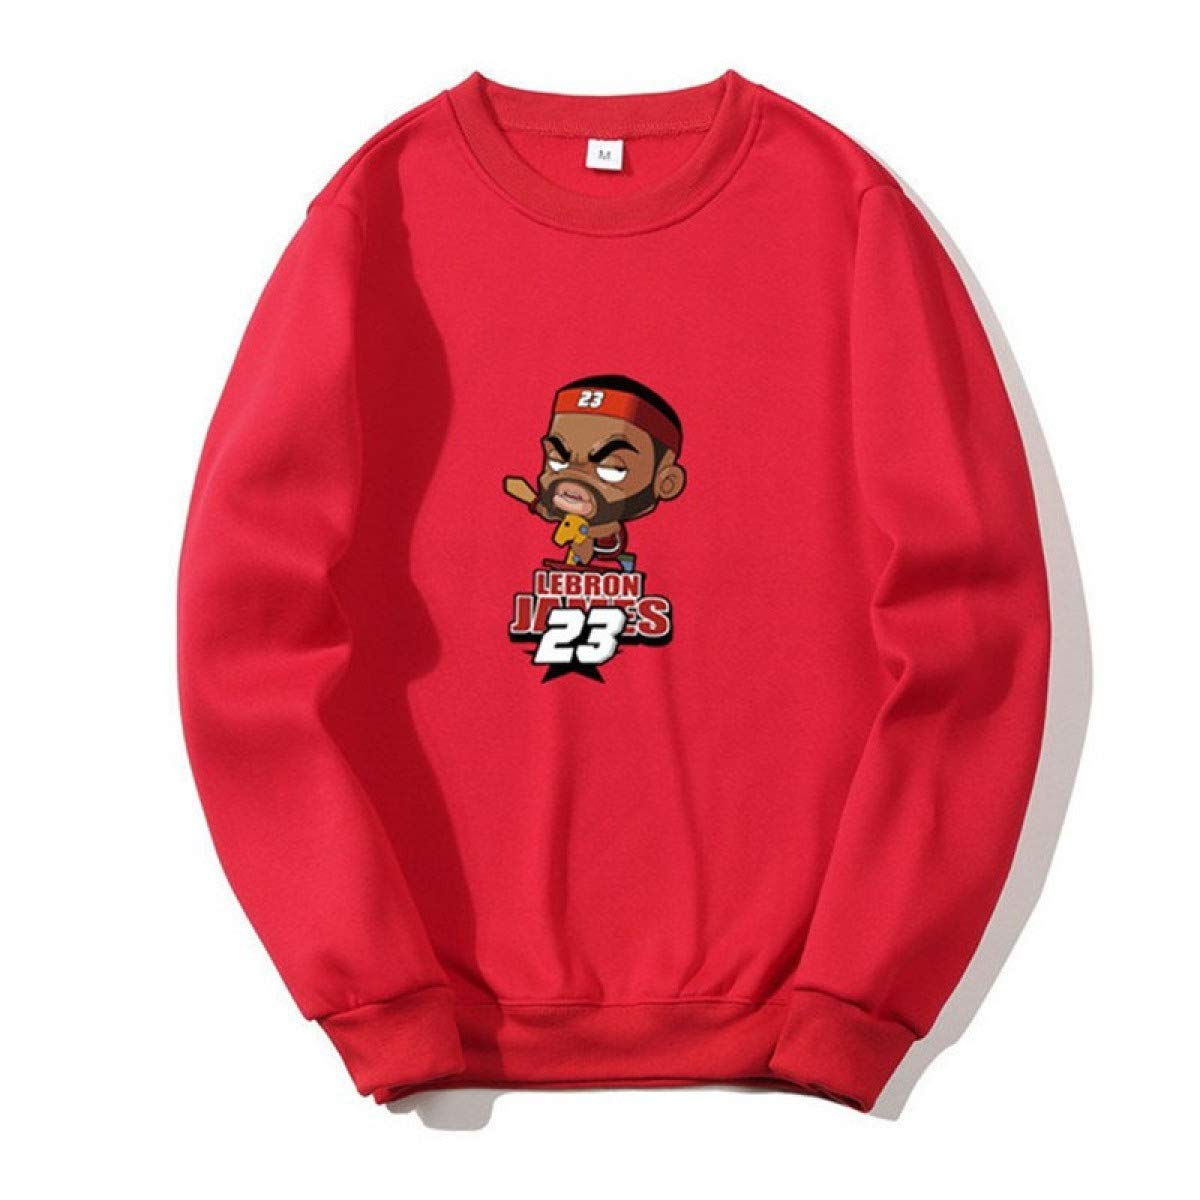 Amazon.com: WEEKEND SHOP Basketball Hoodies Couples Casual Style 3D Print Sweatshirts Hoody Tracksuits: Clothing